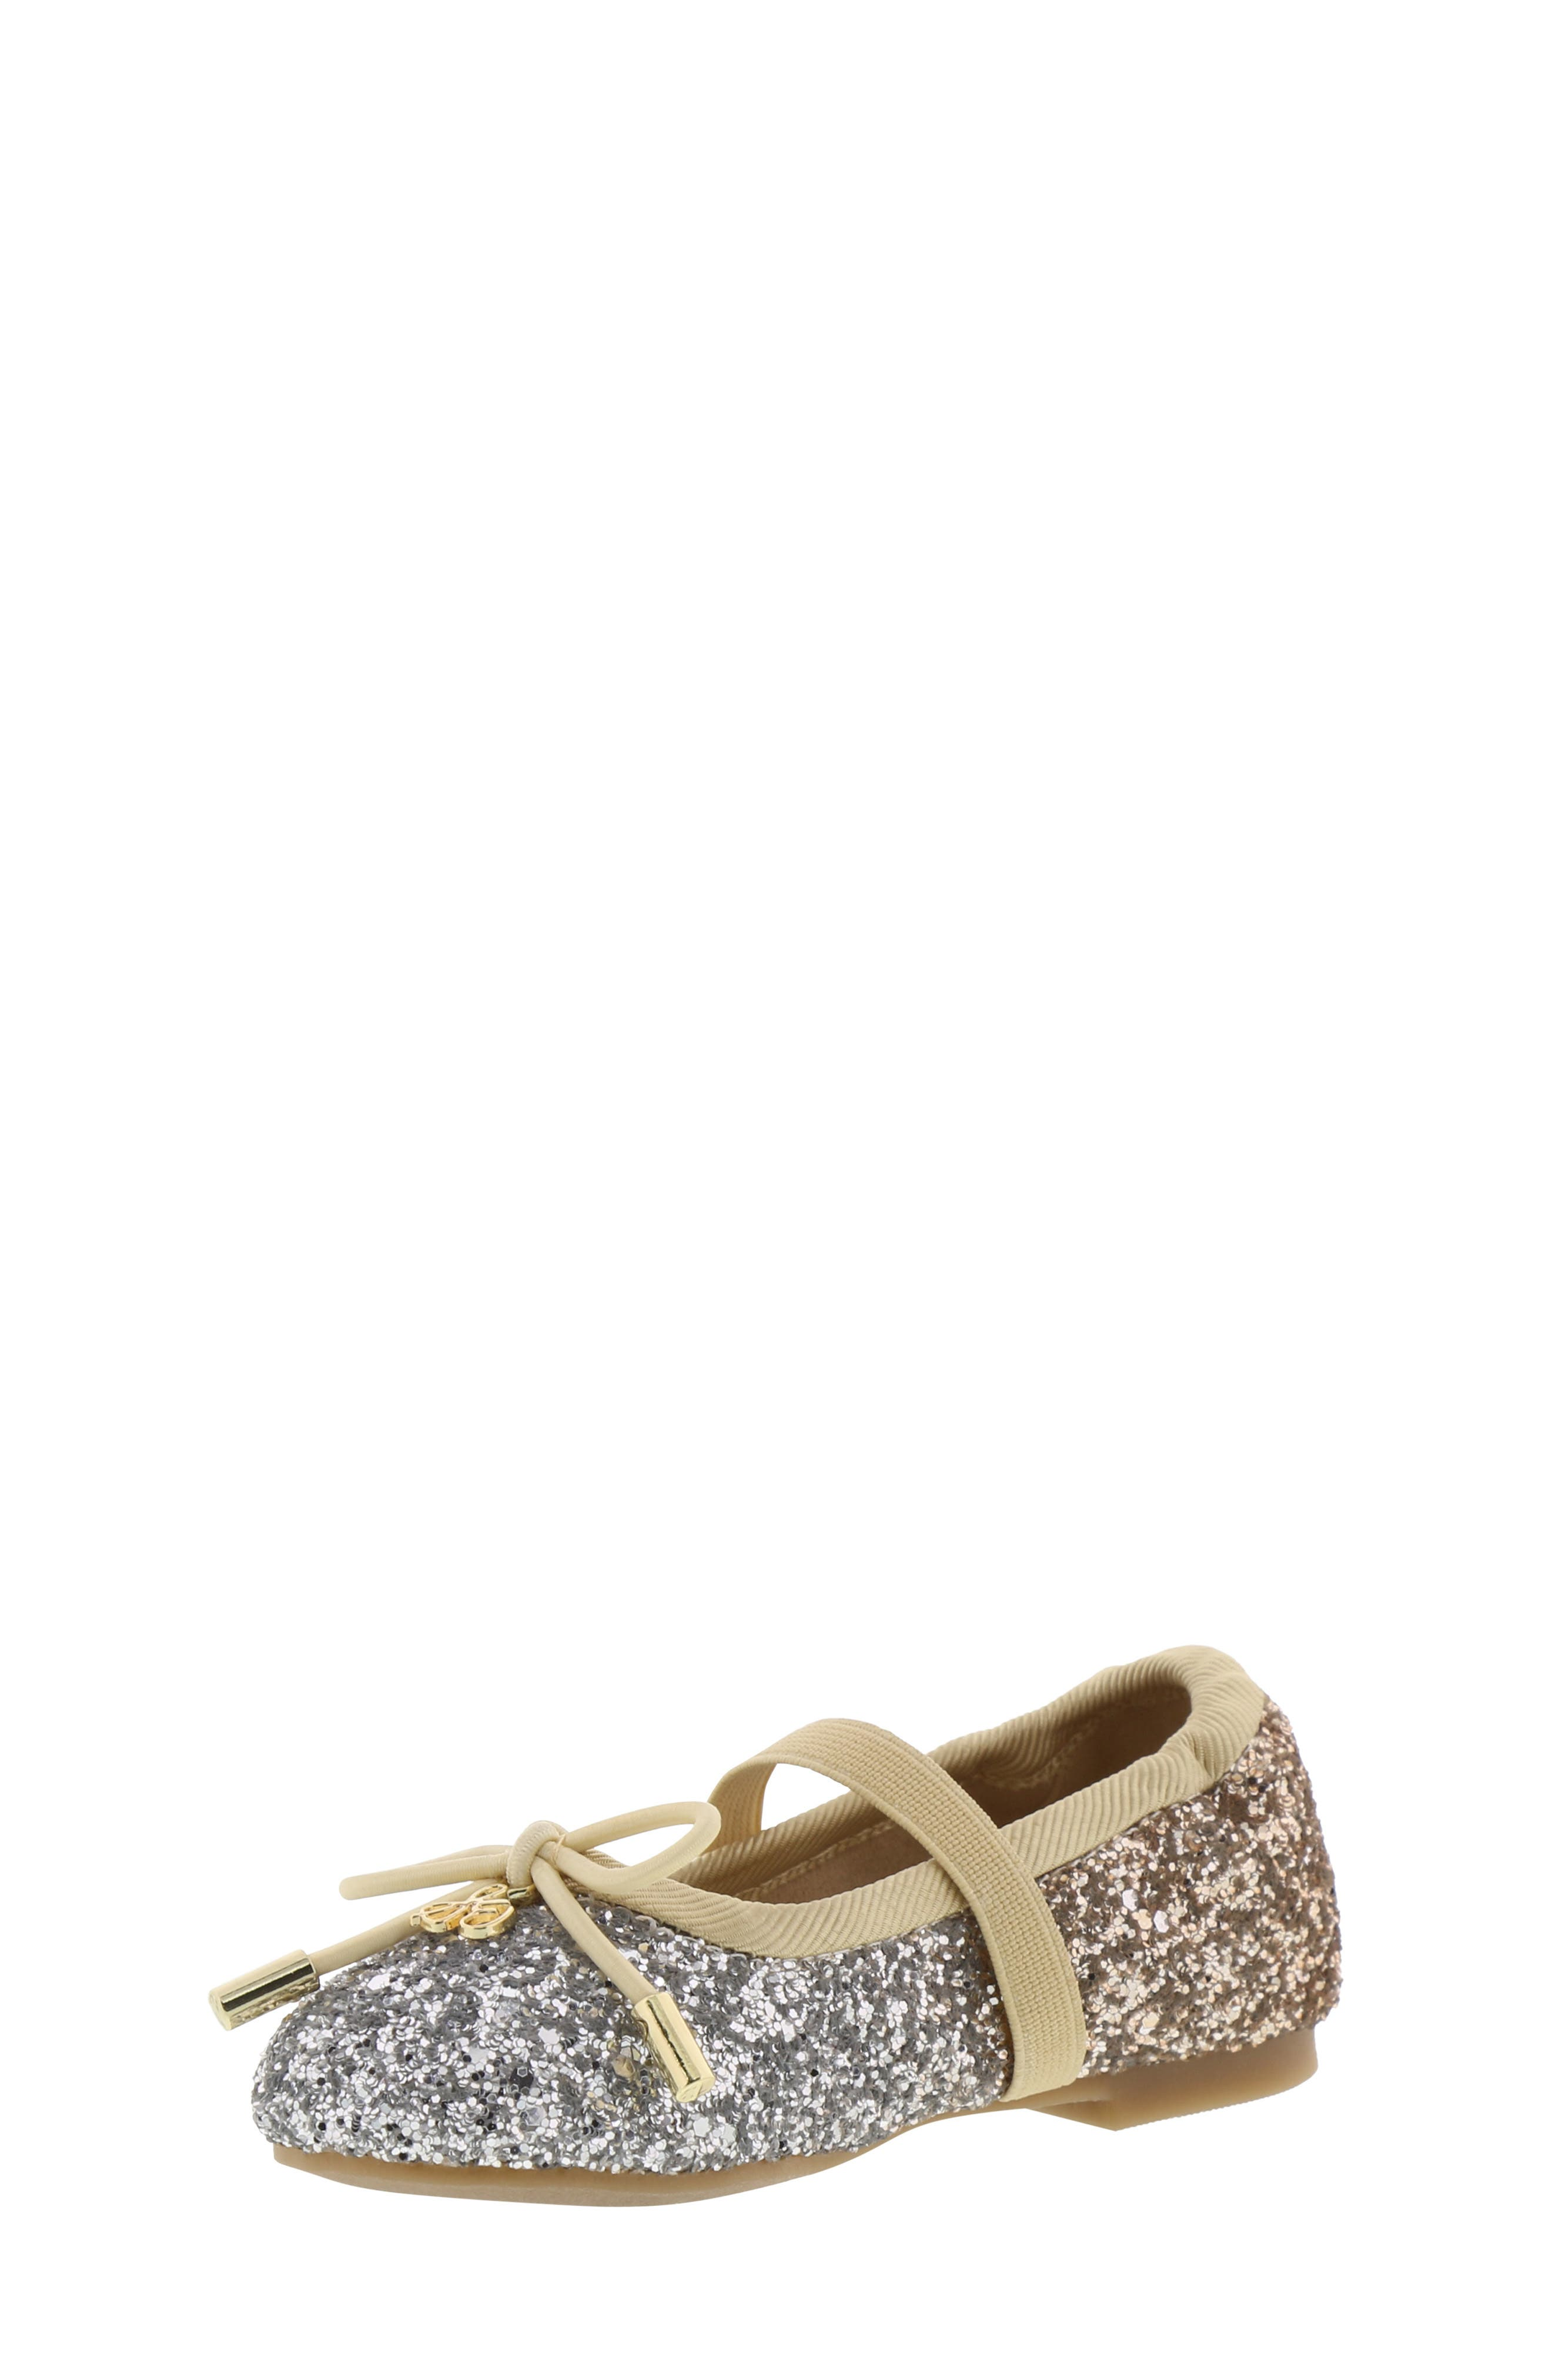 Felicia Ombré Glitter Ballet Flat,                         Main,                         color, SILVER GOLD